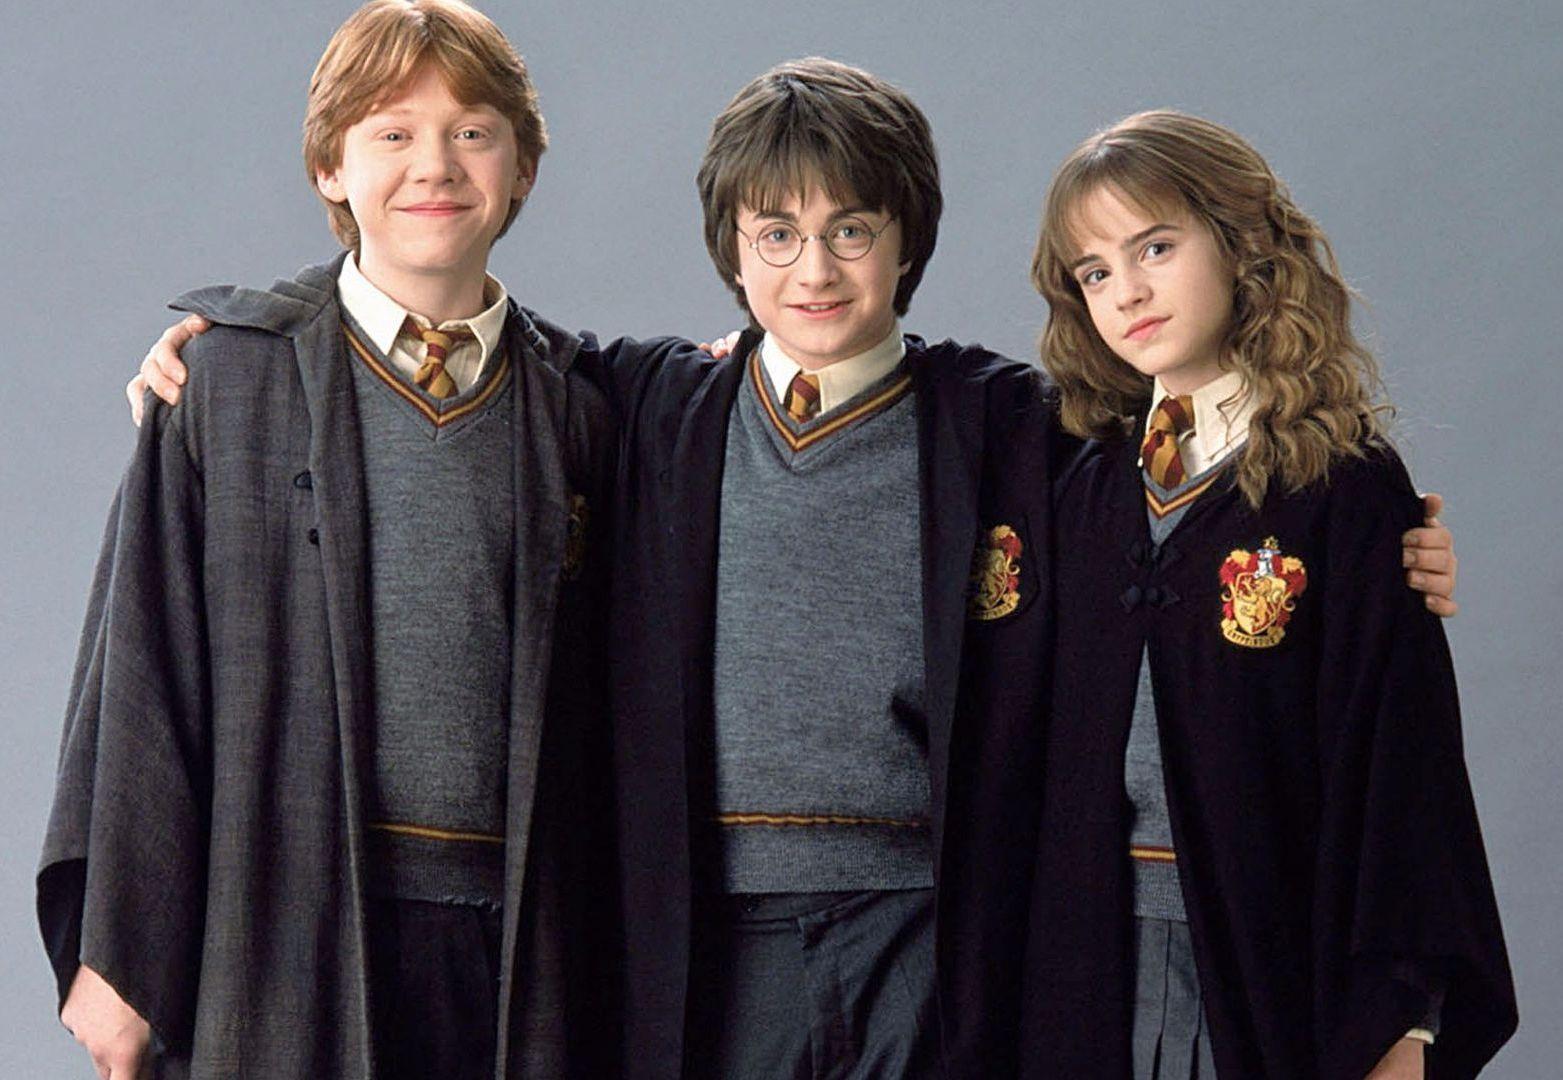 Harry Potter Hermine Granger Kostüm selber machen | Harry potter ...